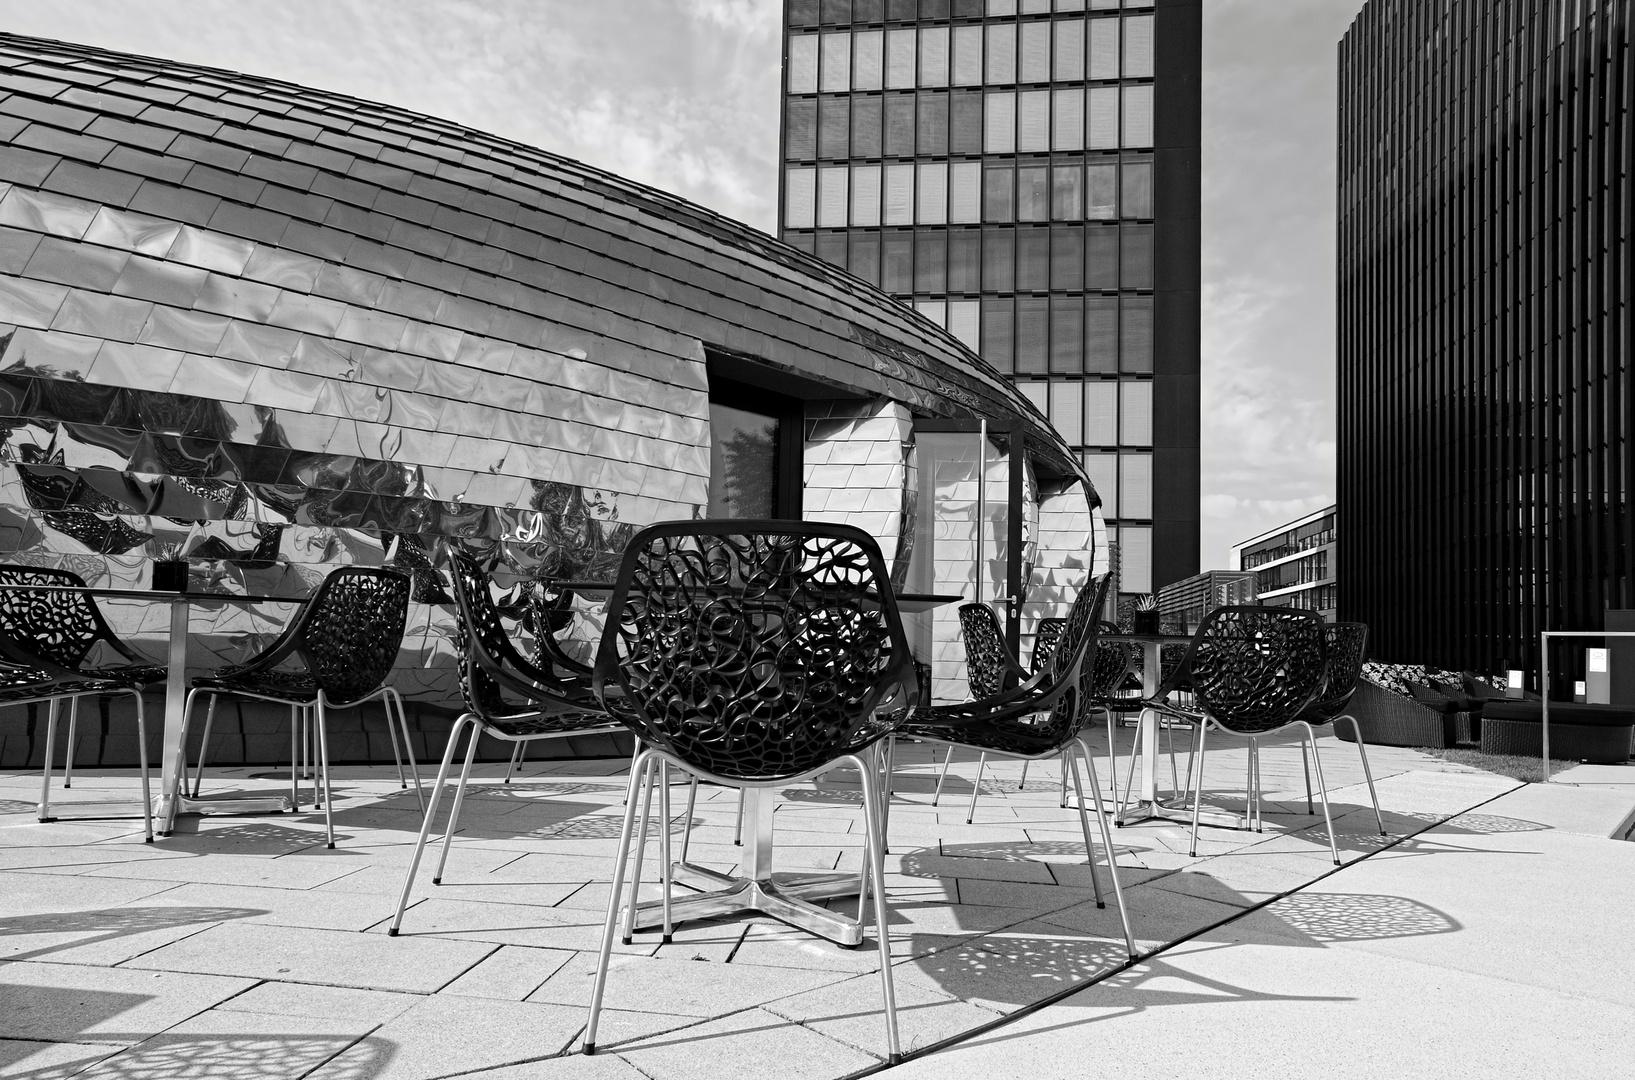 Stühle vor der Lounge